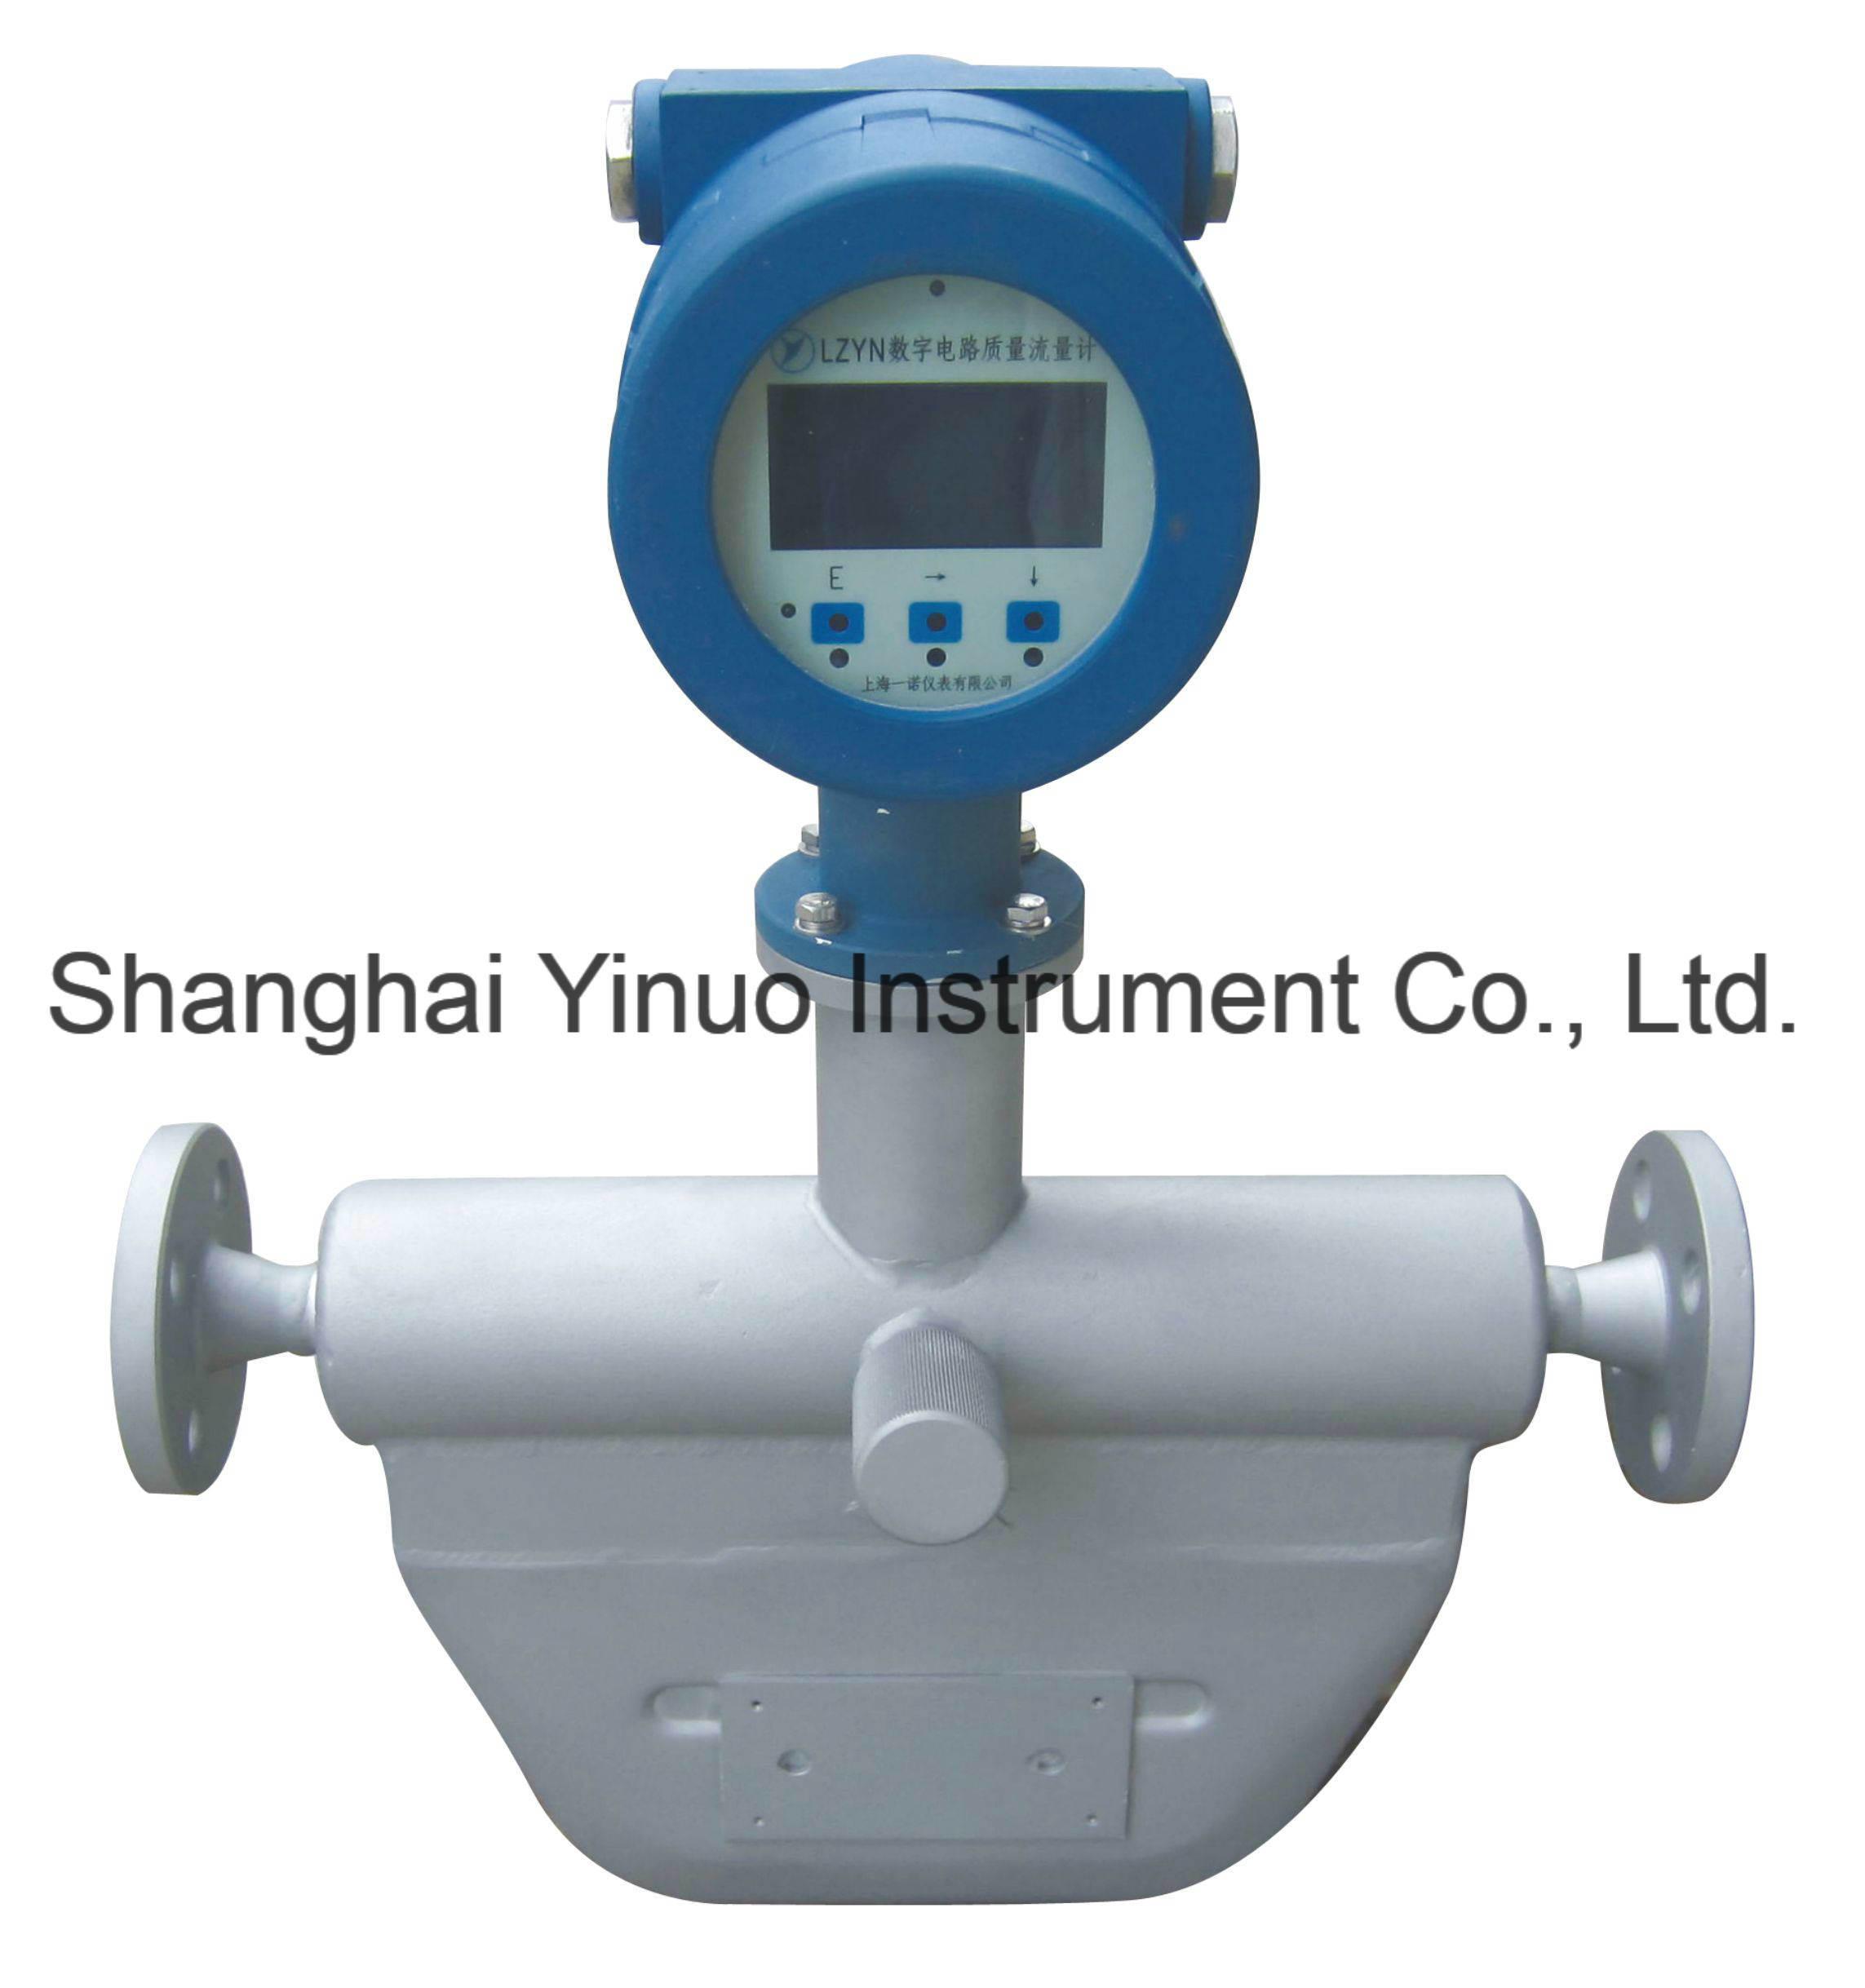 Coriolis Mass Flowmeter (LZYN) for Liquid & High Pressure Gas